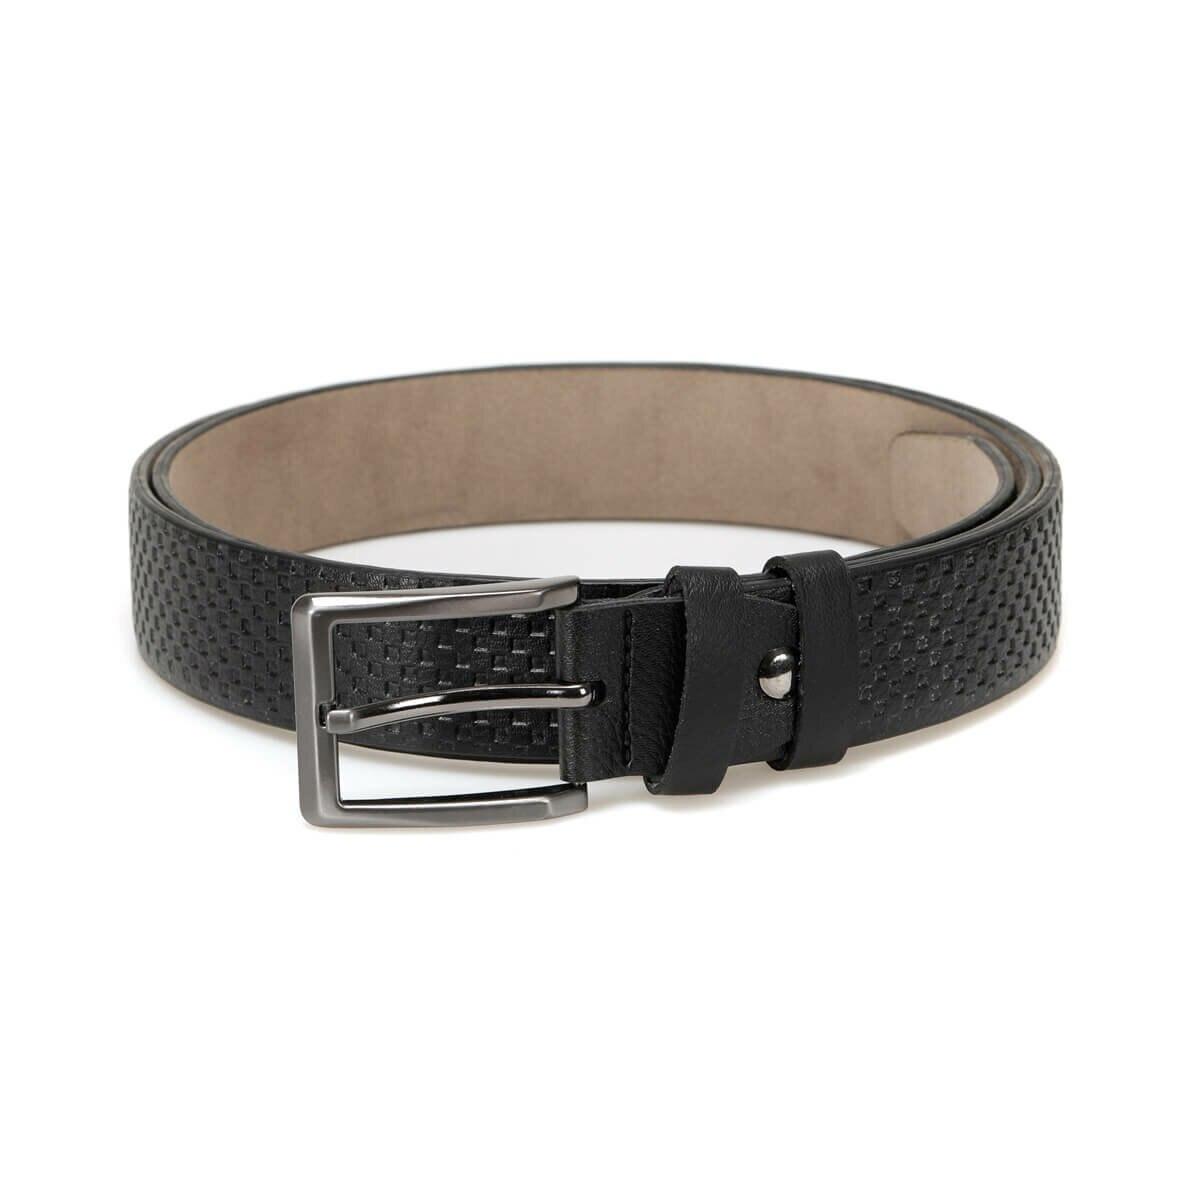 FLO MGVN3510 Black Male Belt Garamond